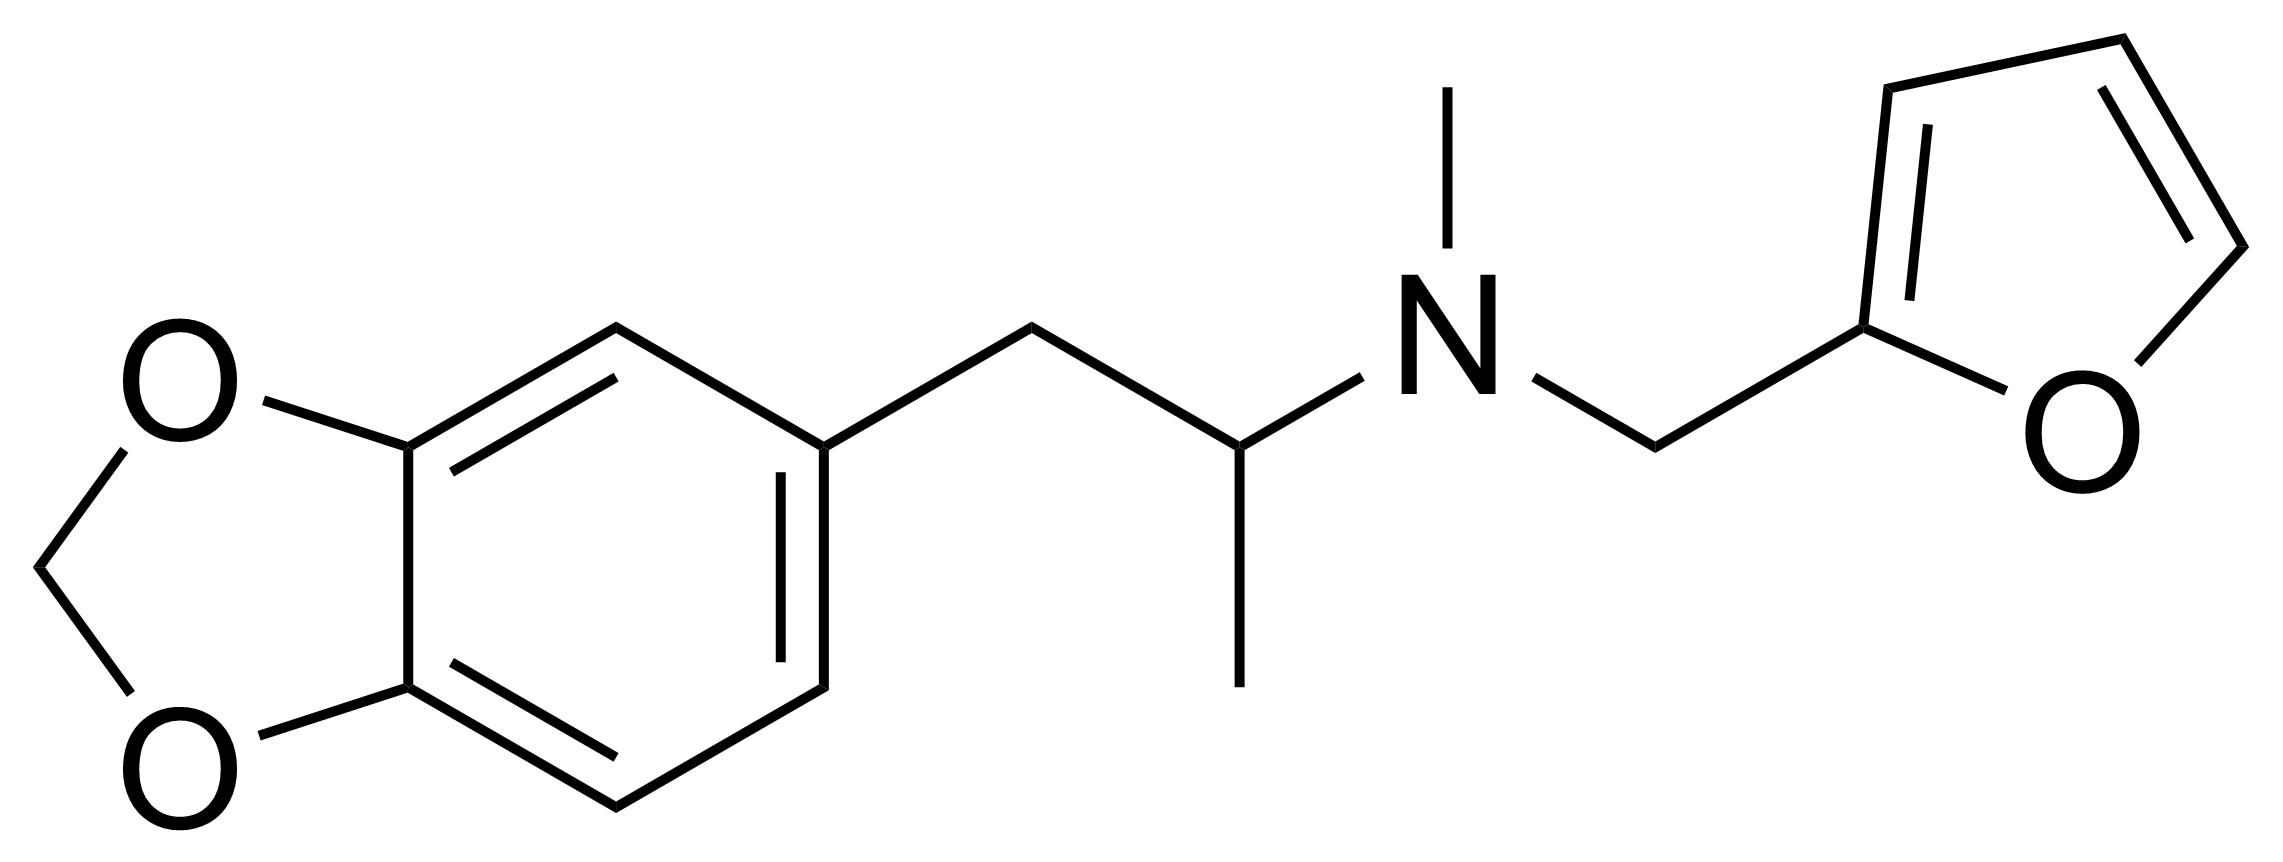 the description of the ecstasy chemical methylene dioxymenthamphetamine The description of the ecstasy chemical methylene-dioxymenthamphetamine  more essays like this: chemical dioxymenthamphetamine, description.